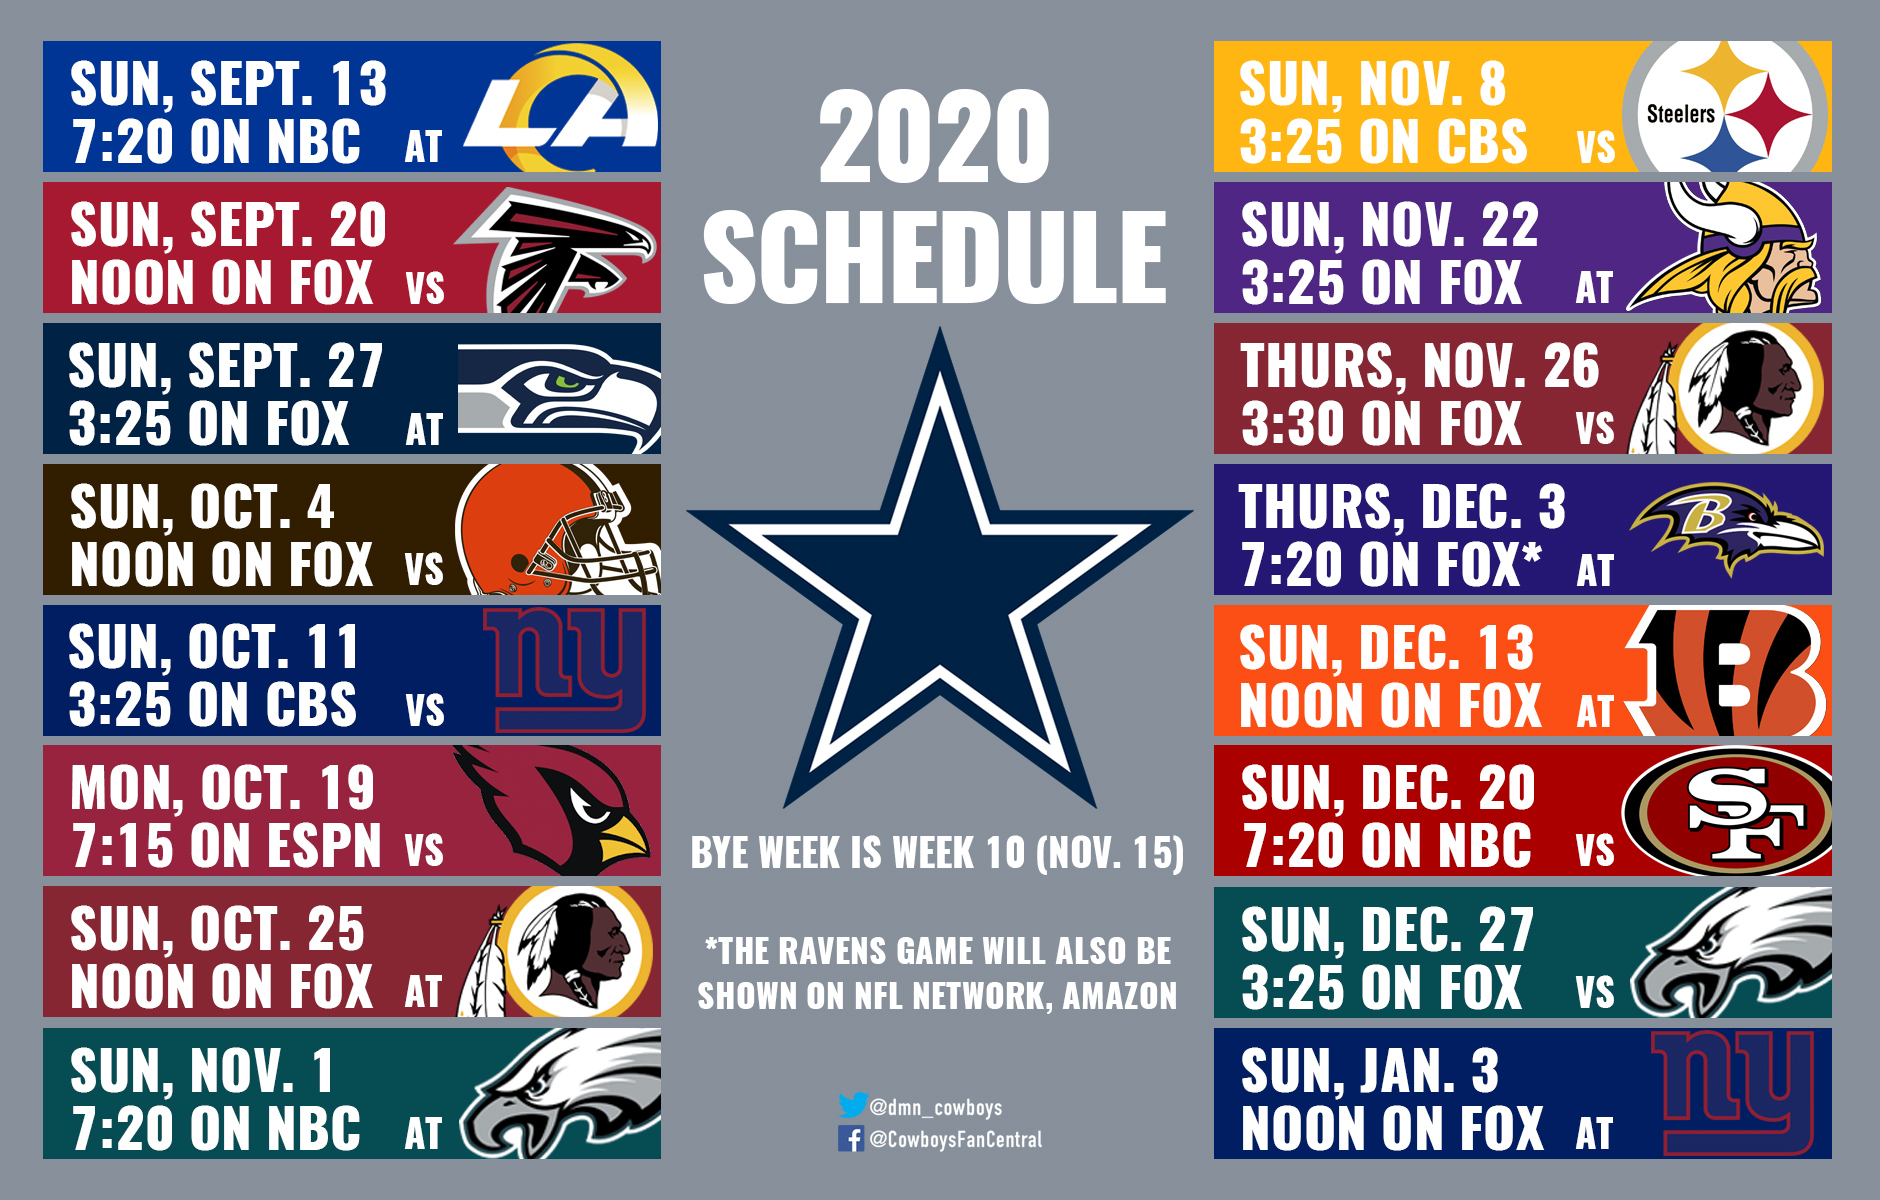 Nfl Football Schedule 2020 Printable